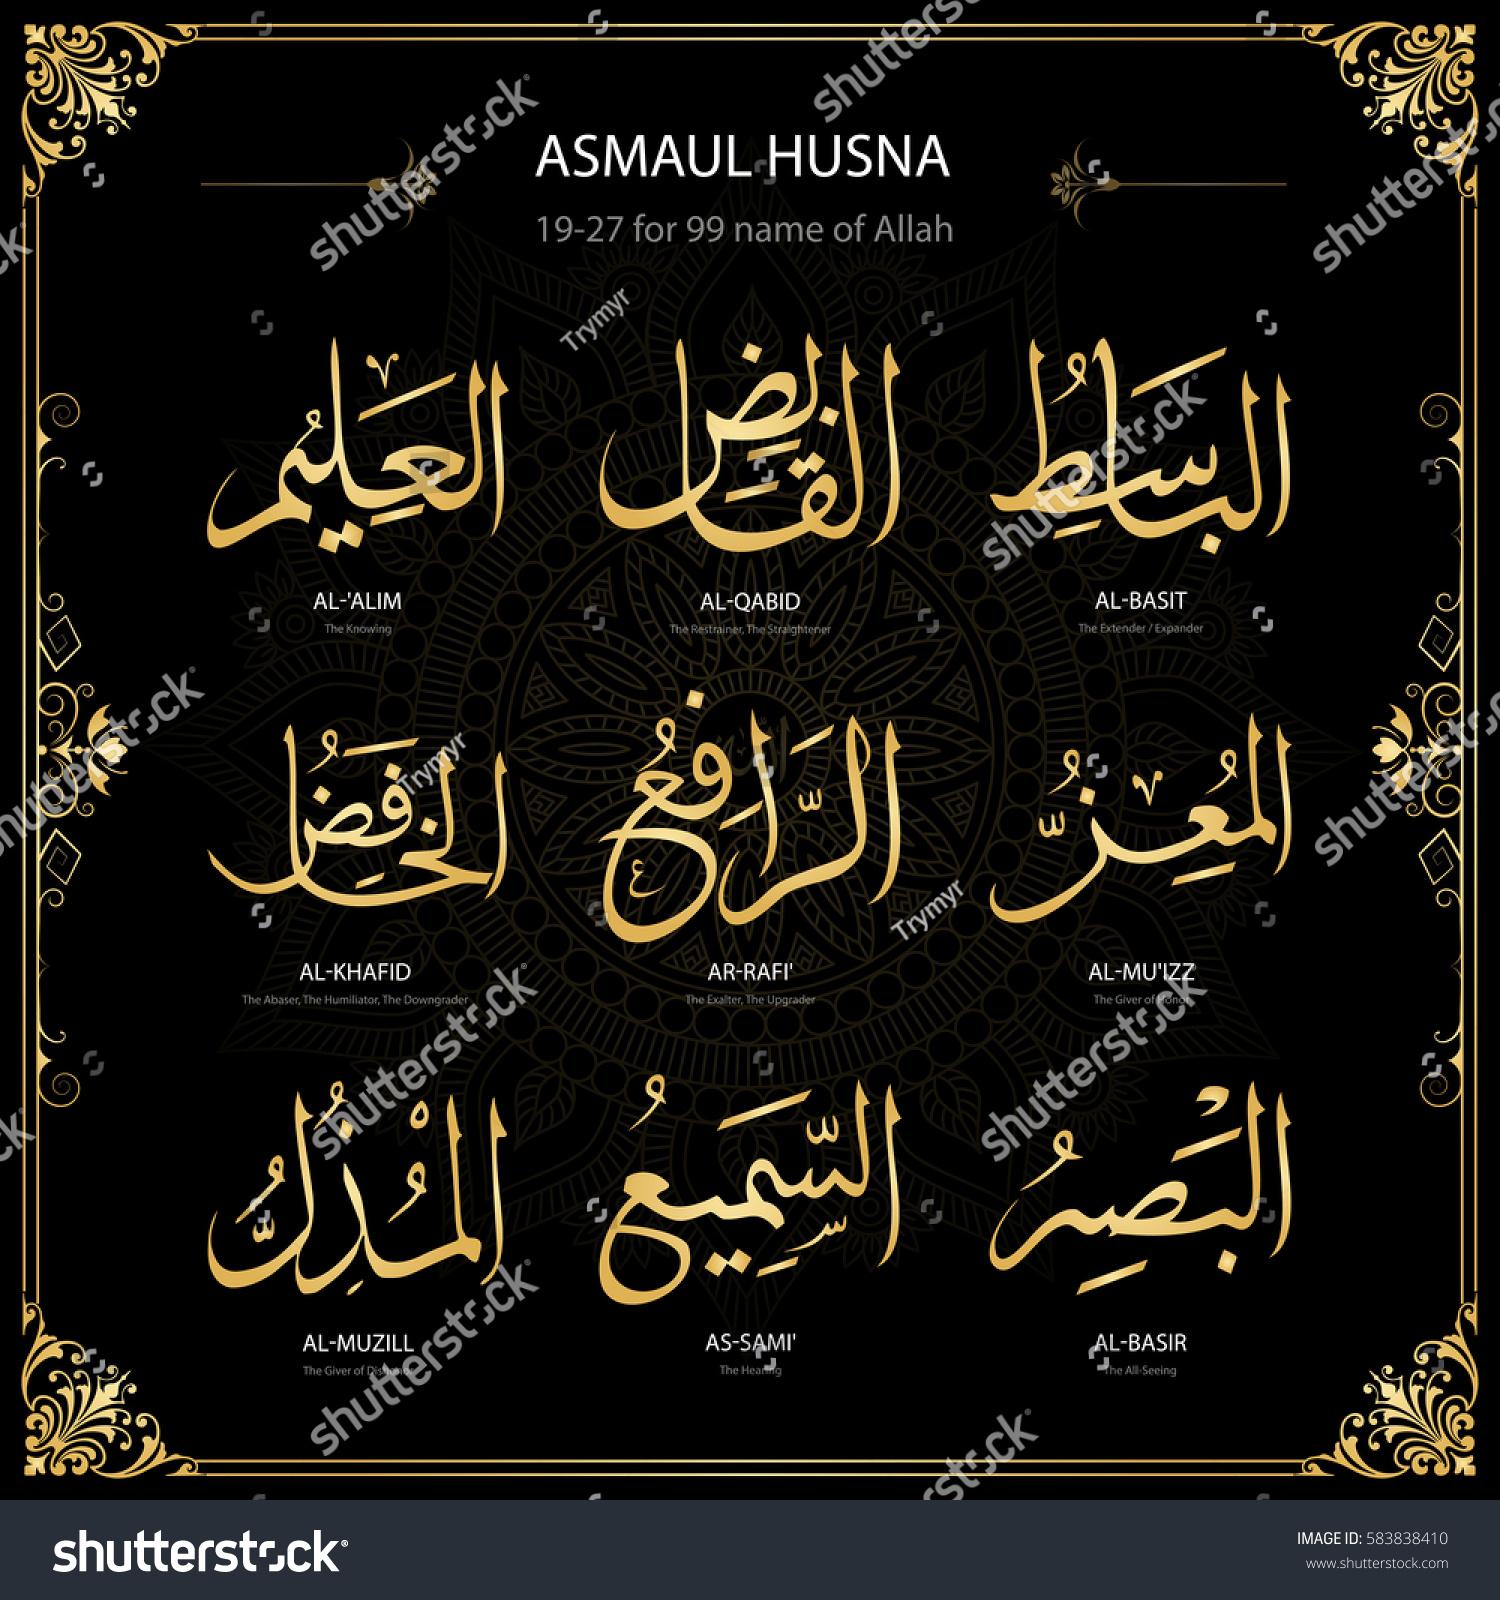 Asmaul Husna 99 Names Of Allah Vector Arabic Calligraphy Suitable For Print